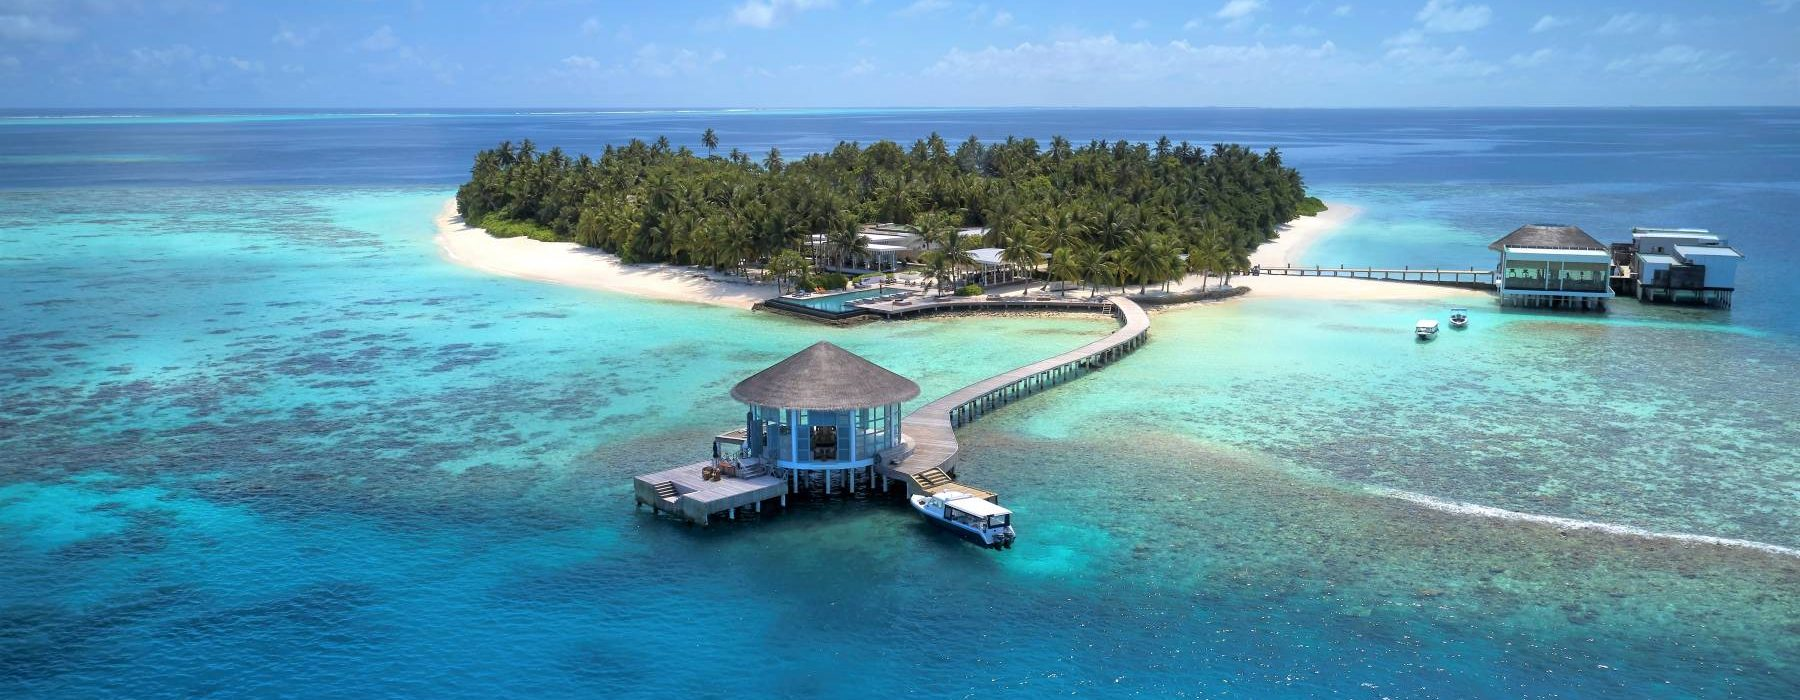 Raffles Maldives Meradhoo - All-Inclusive Island Buyout